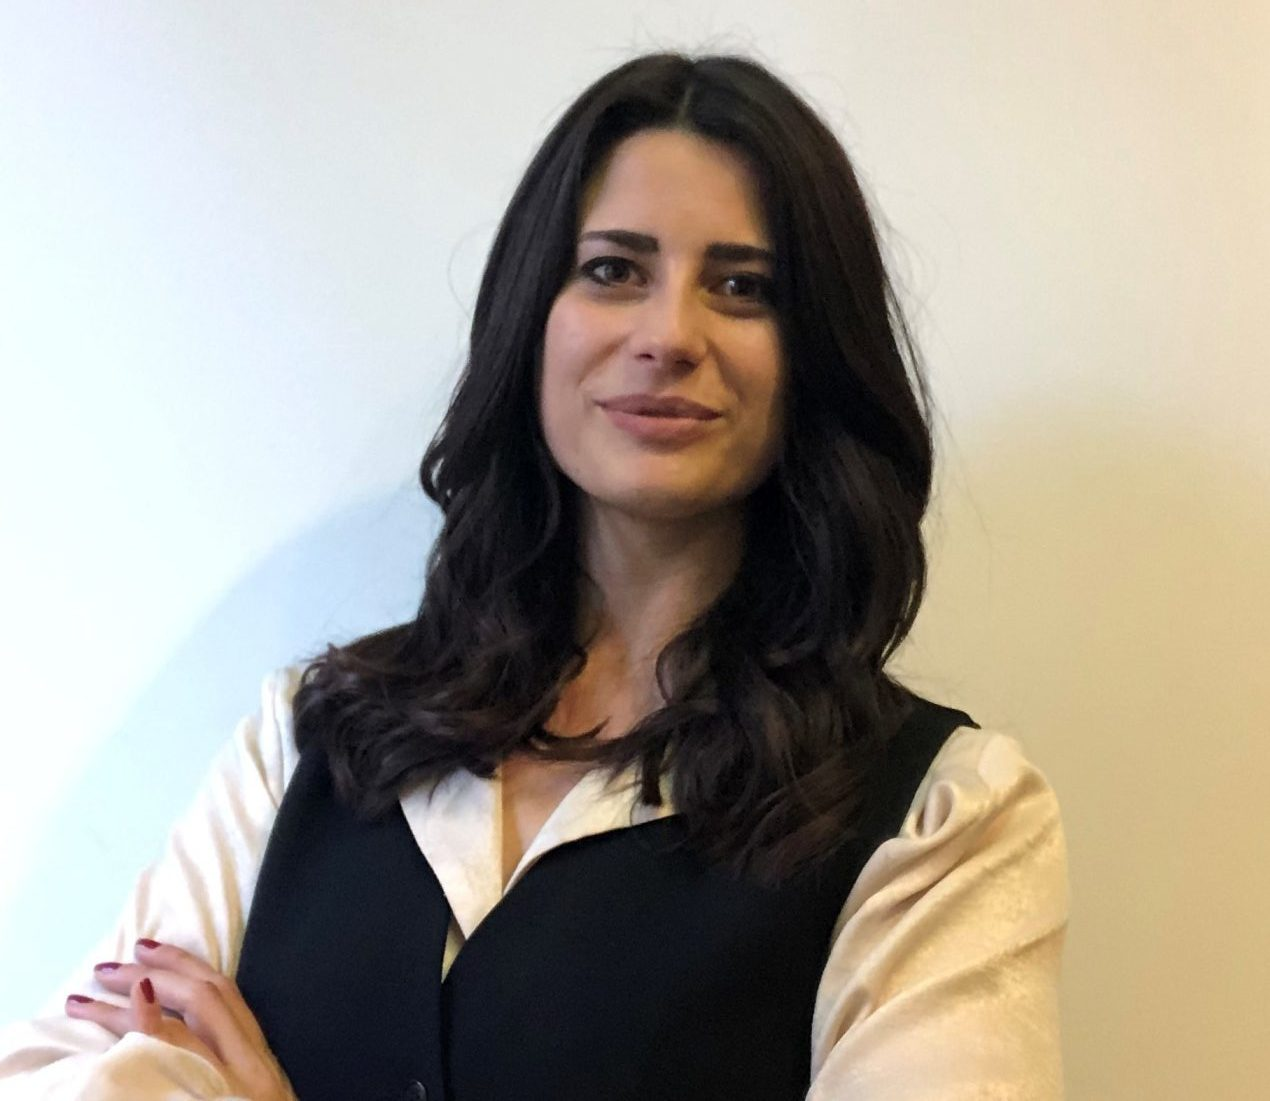 Eleonora Emilani